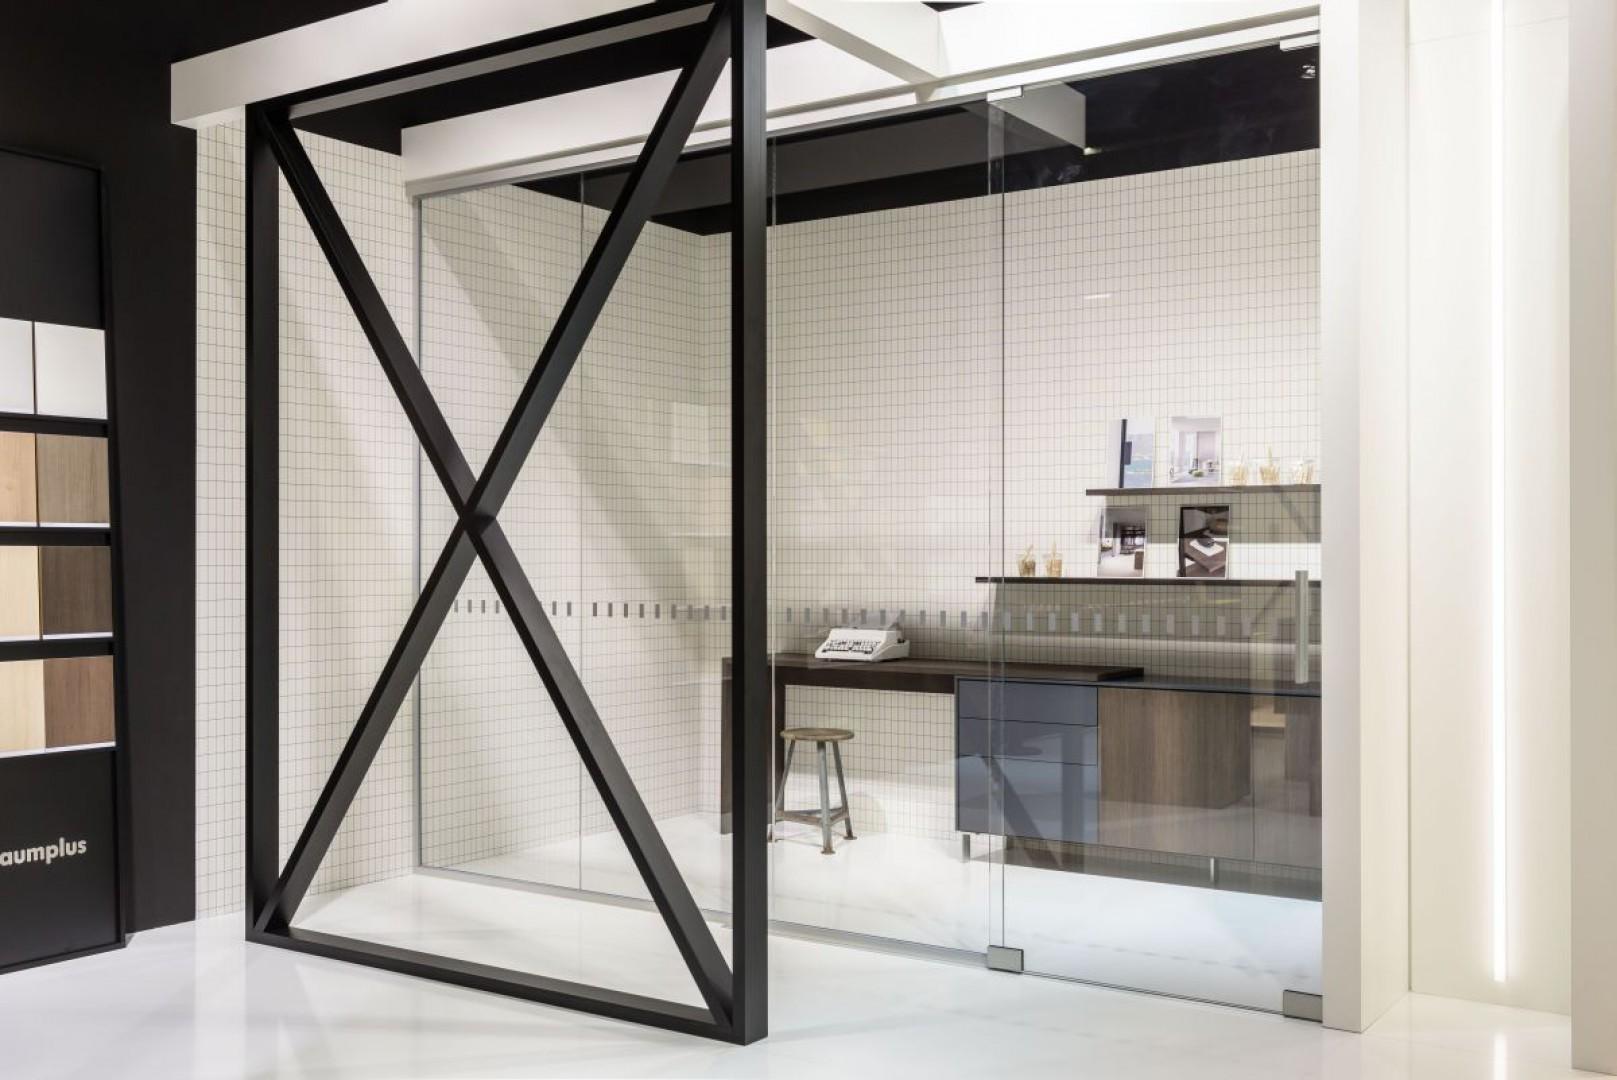 System All Glass Door firmy Raumplus. Fot. Raumplus